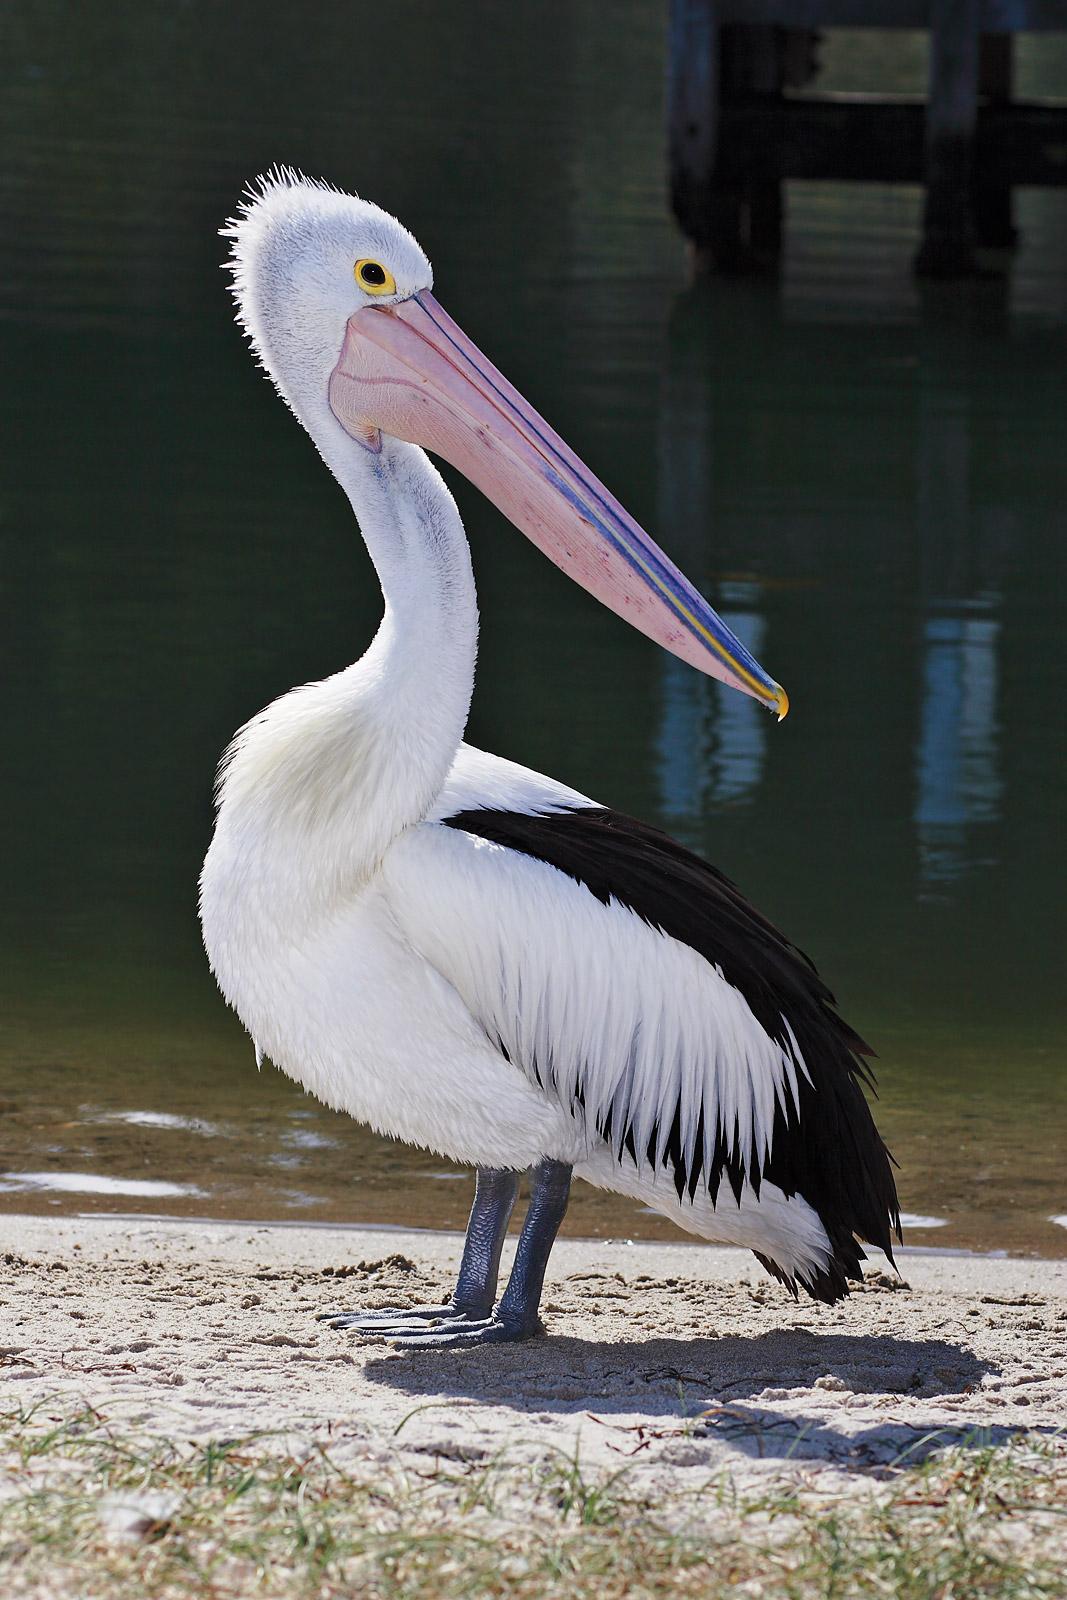 Australian pelican - Wikipedia, the free encyclopedia